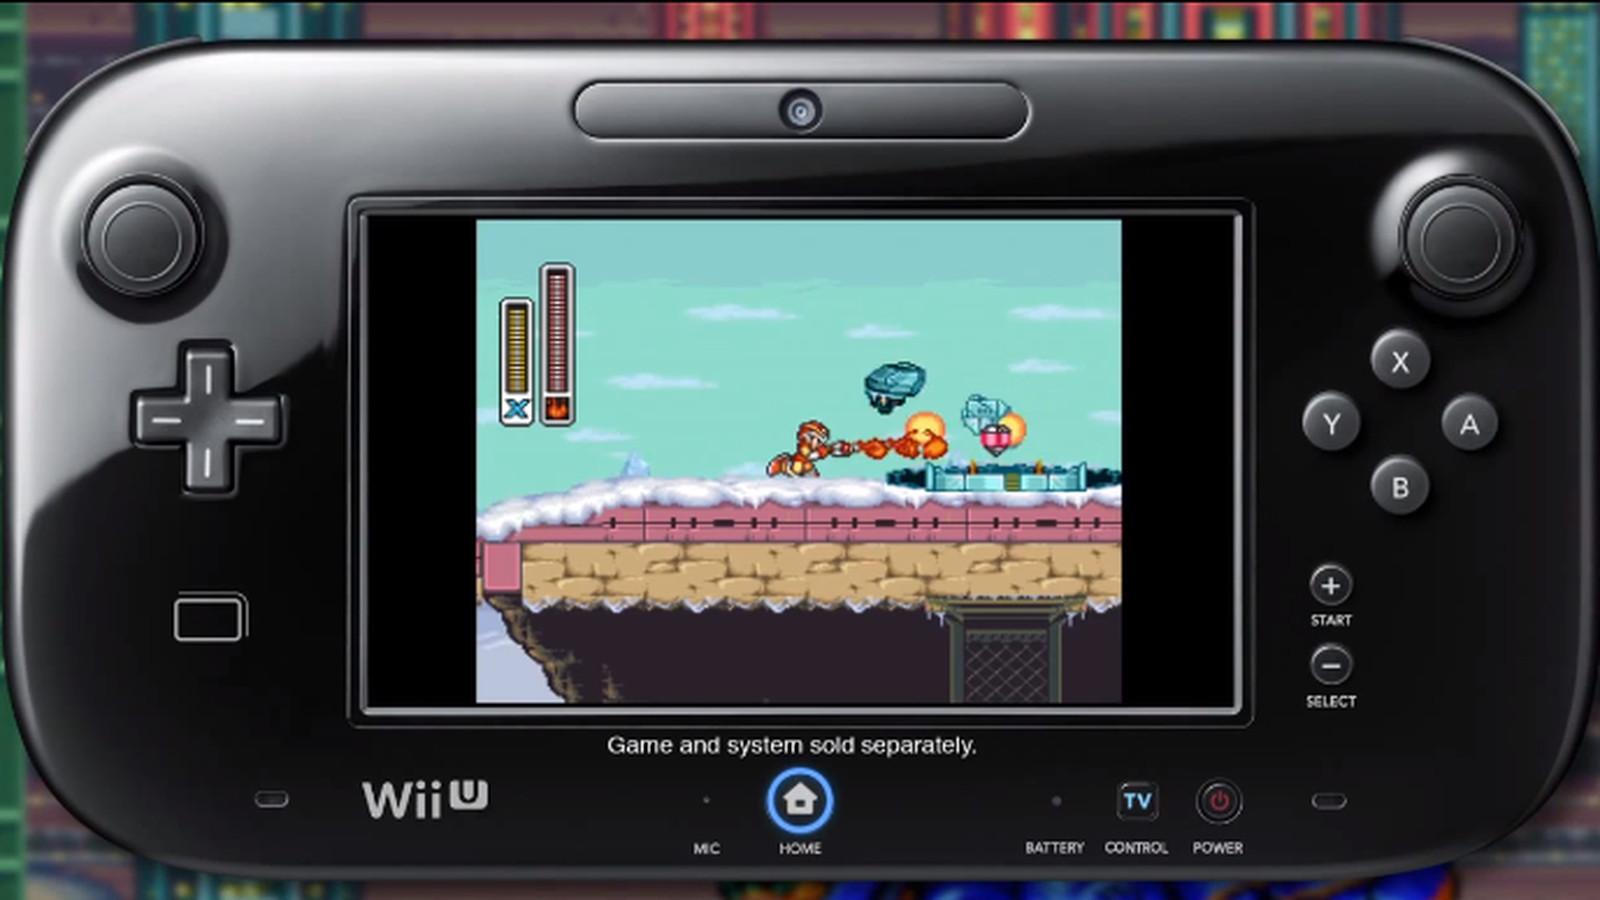 Mega man x launching for wii u virtual console may 30 polygon - Megaman x virtual console ...